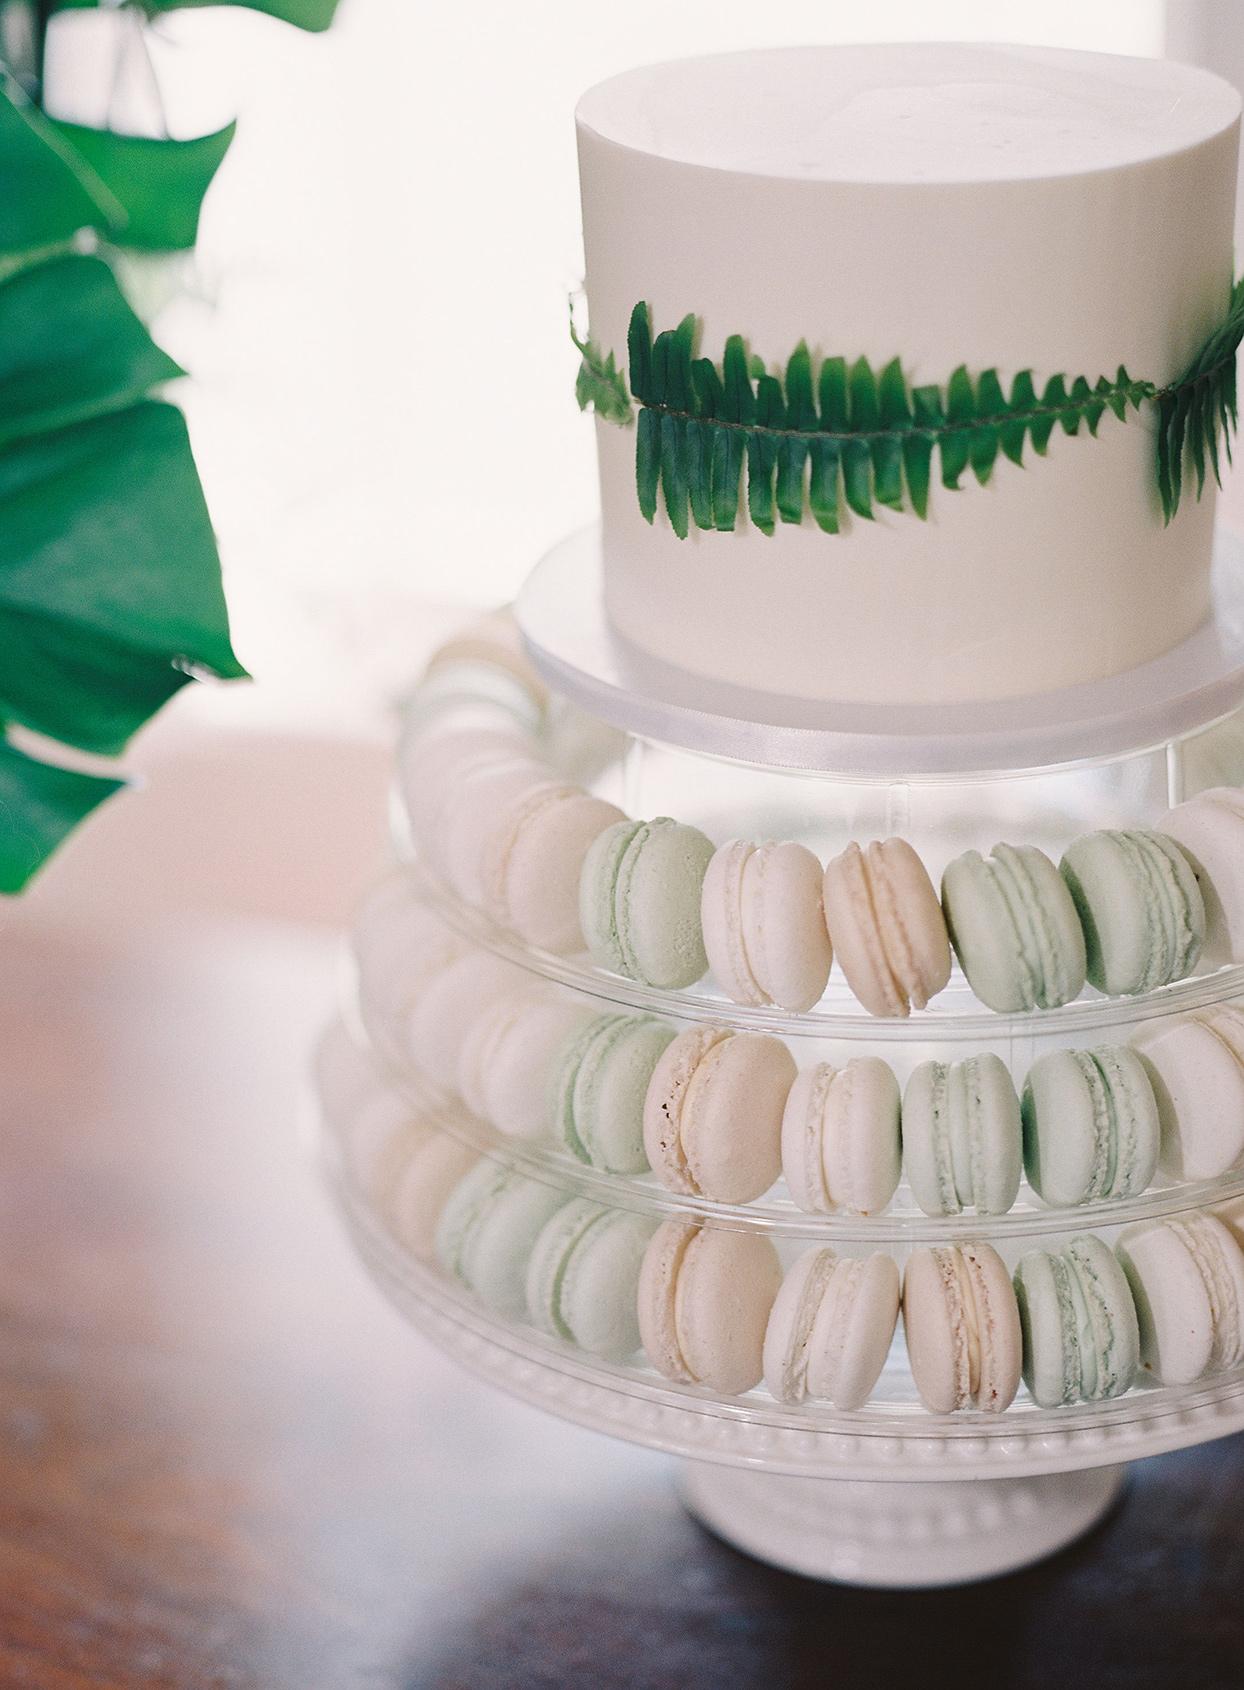 beverly steve wedding cake with macarons